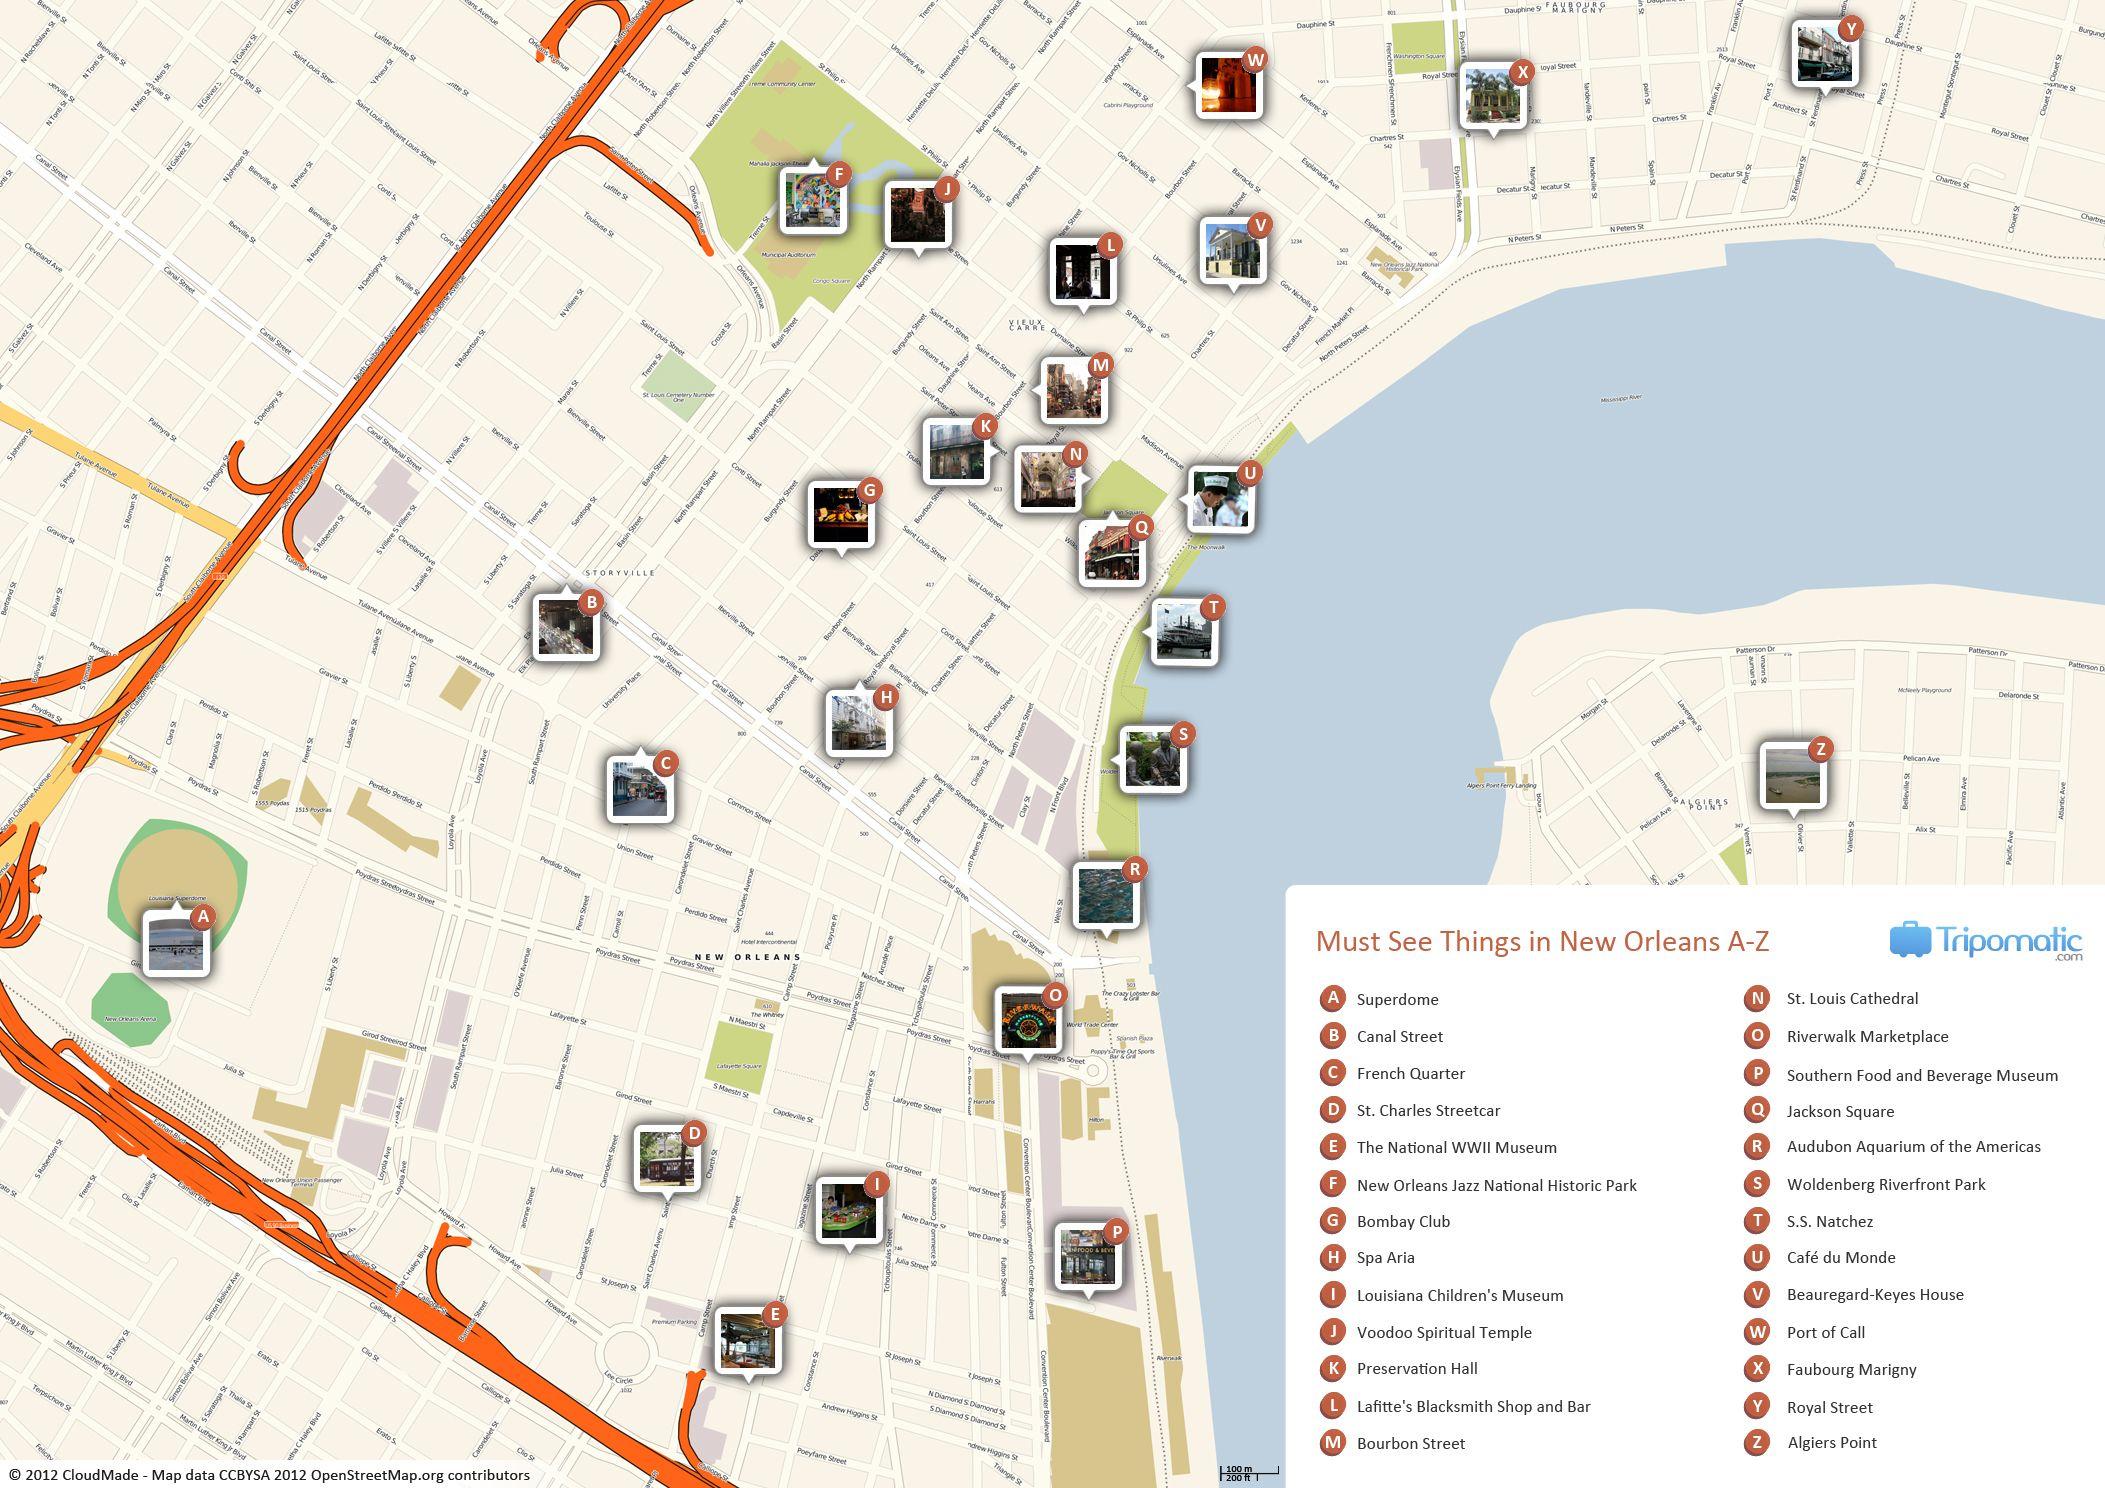 New Orleans Printable Tourist Map | Free Tourist Maps ✈ | Tourist - Printable Walking Map Of New Orleans